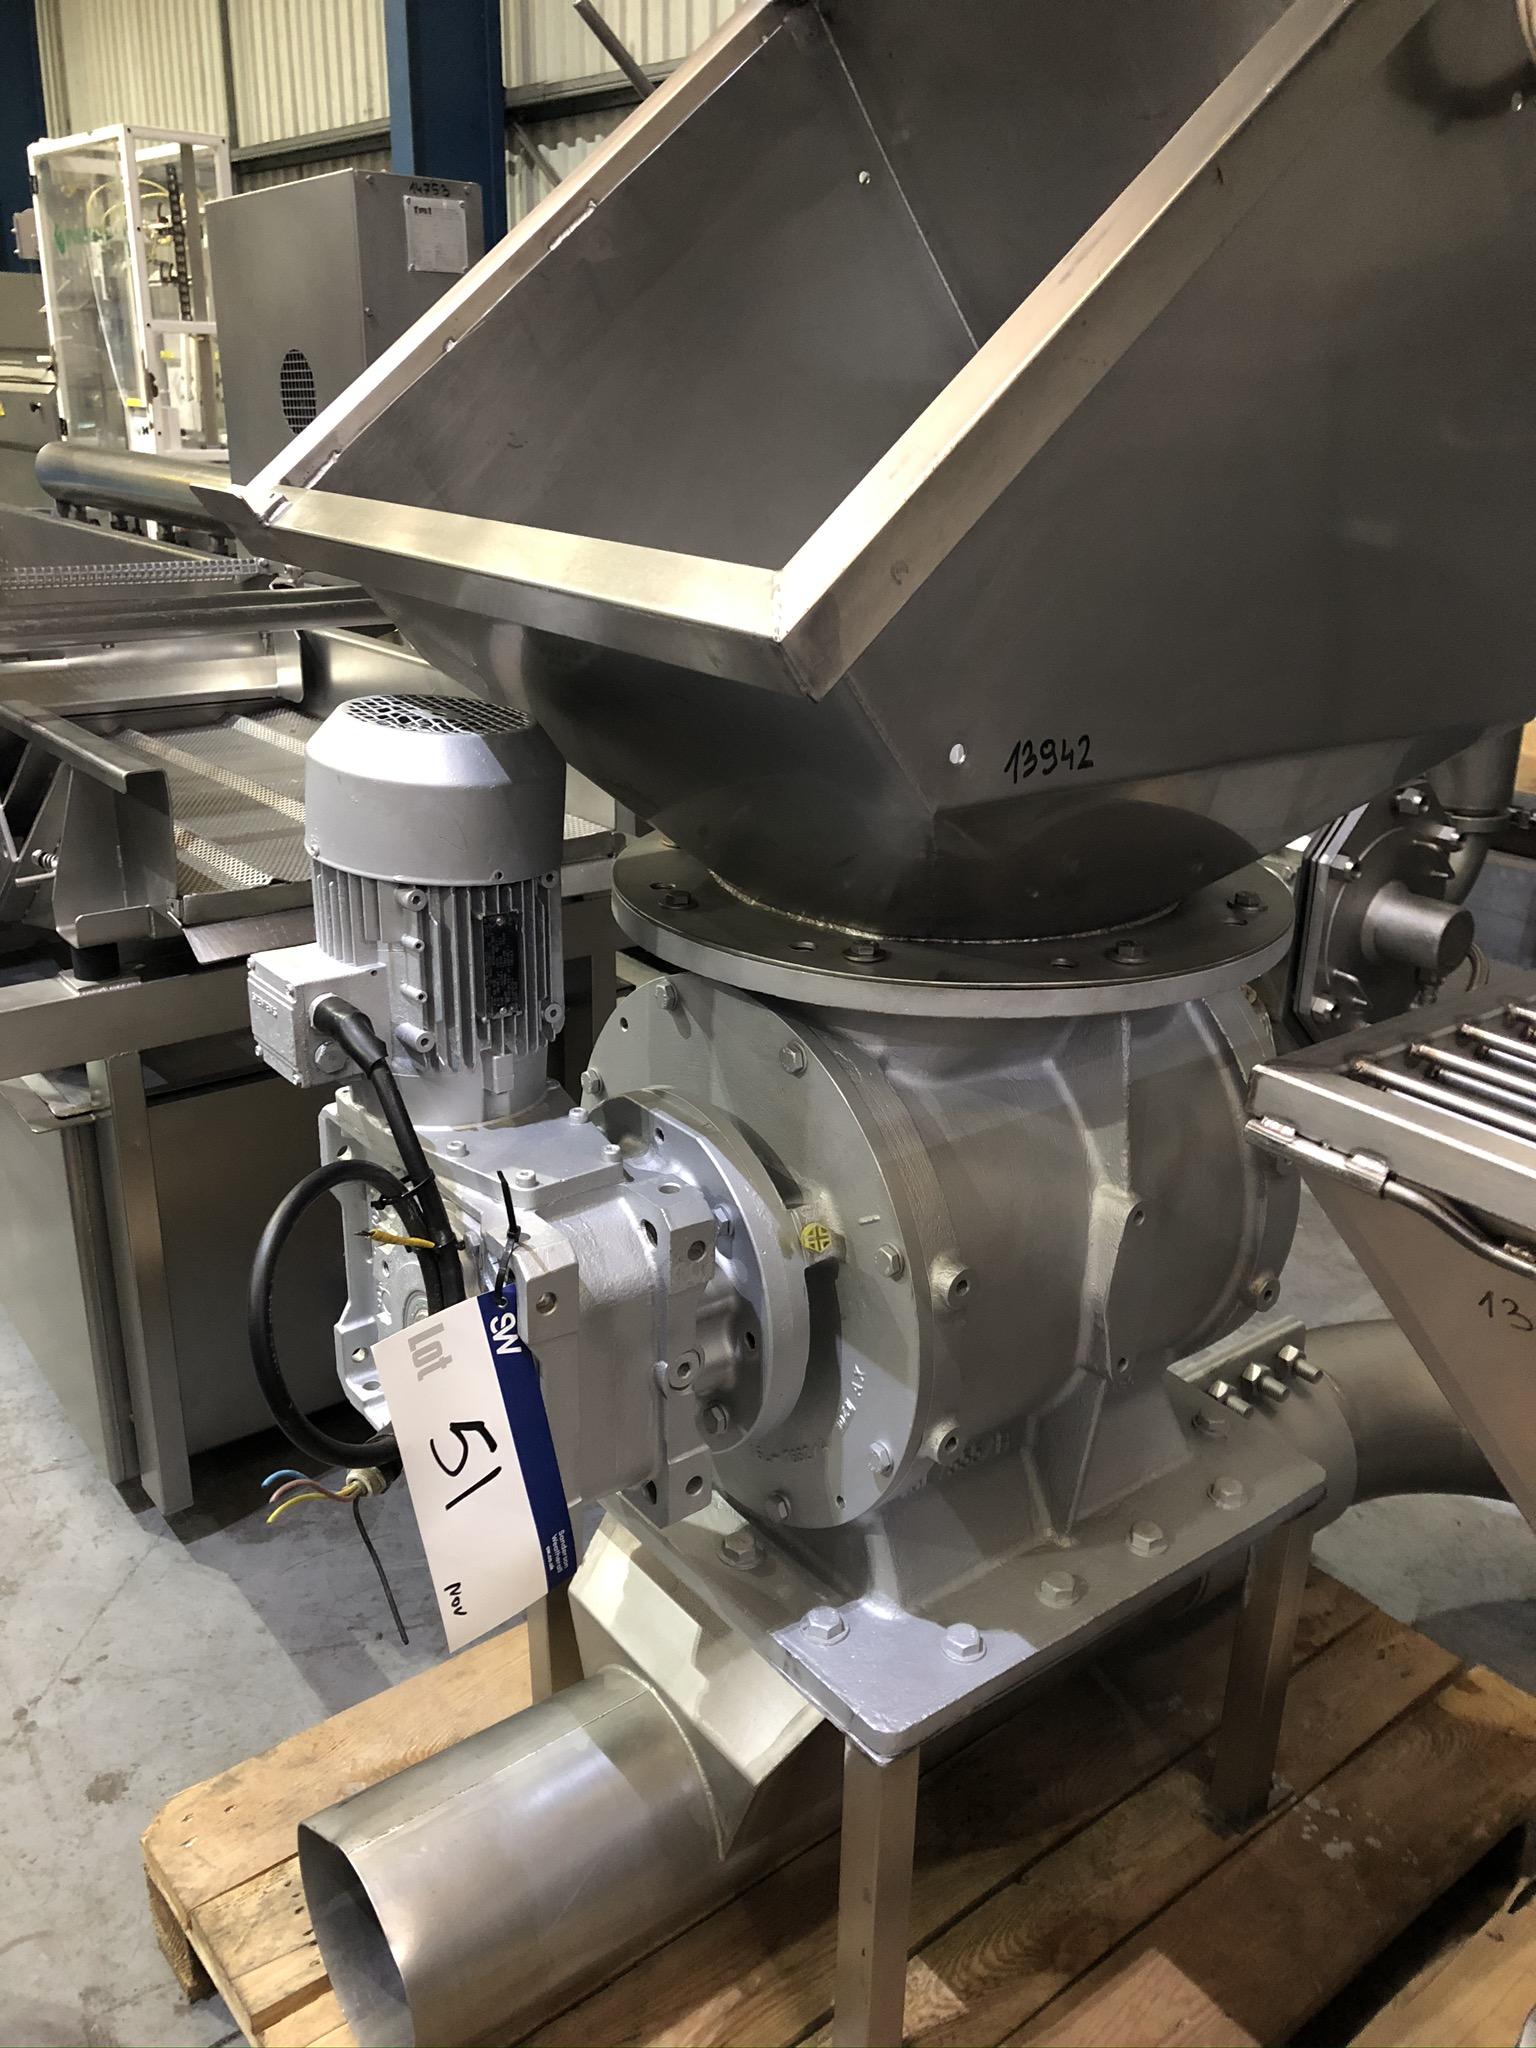 Lot 51 - Bonfiglioli Product Pump - Lacerator, plant no. 51